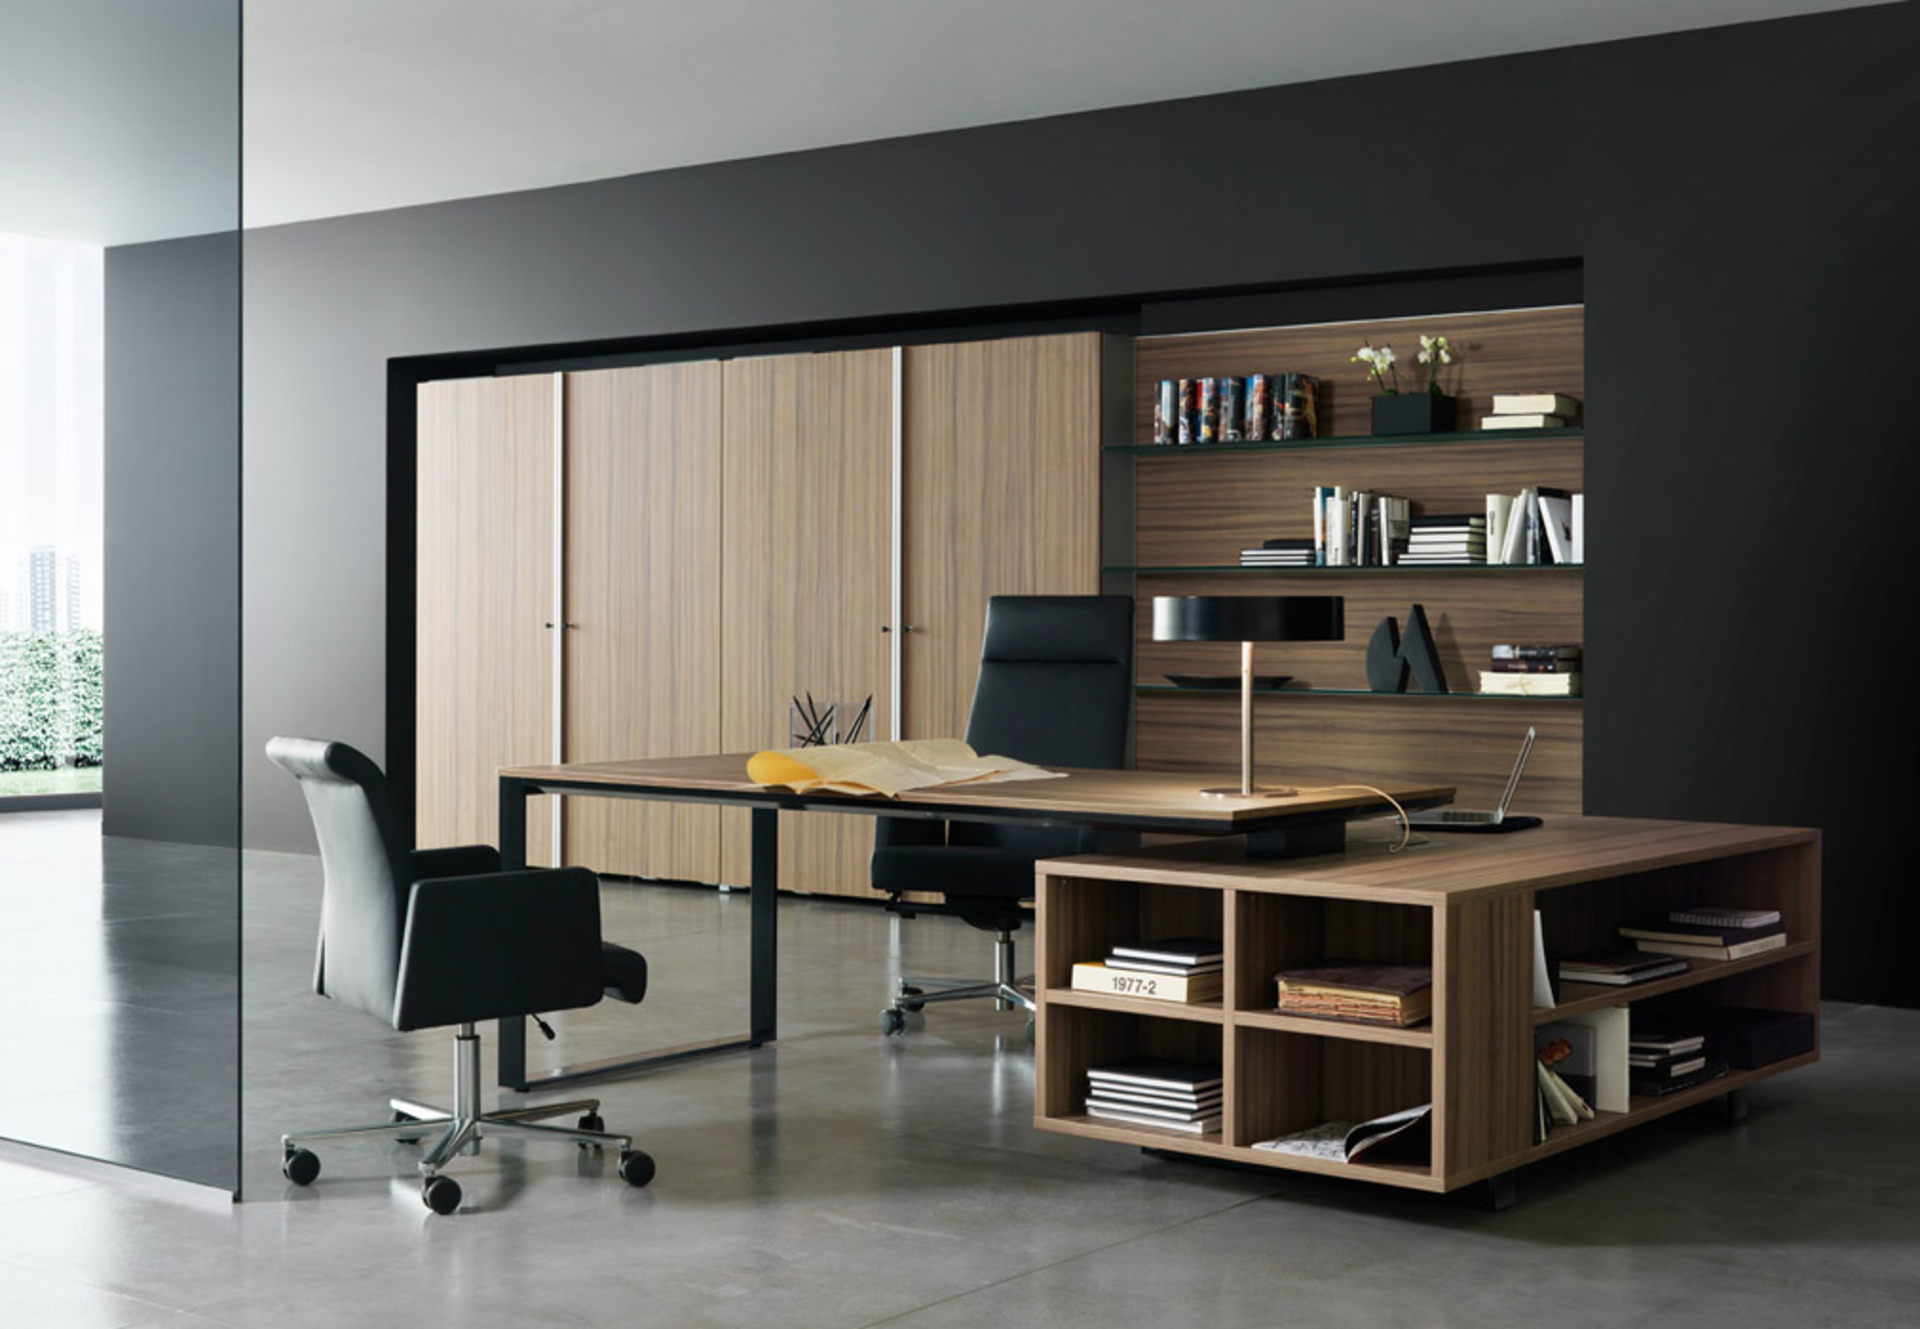 Hipcouch | Complete Interiors U0026 Furniture